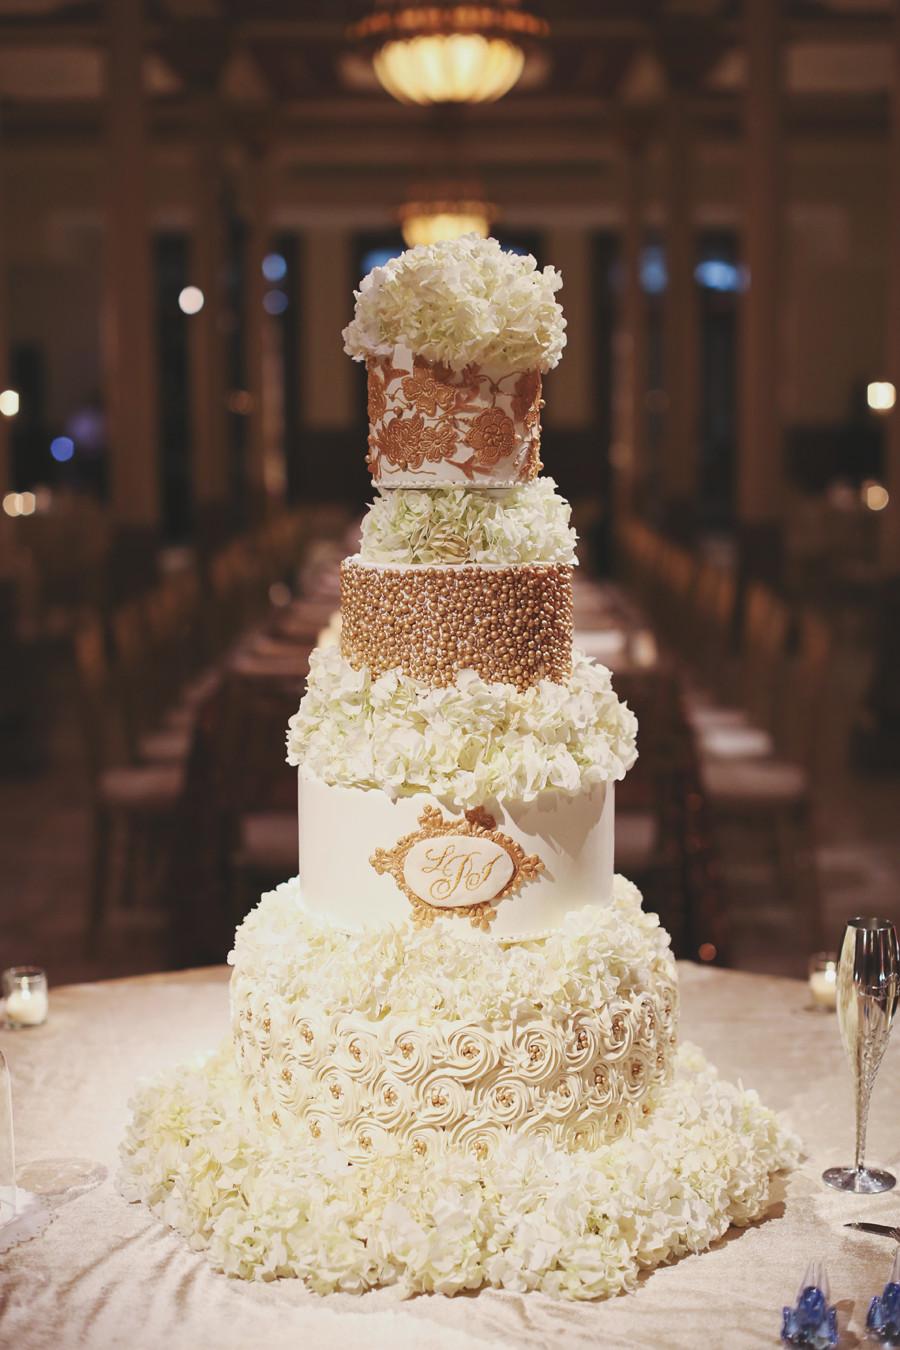 Wedding Cakes White And Gold  Elegant Gold and White Wedding Cake Elizabeth Anne